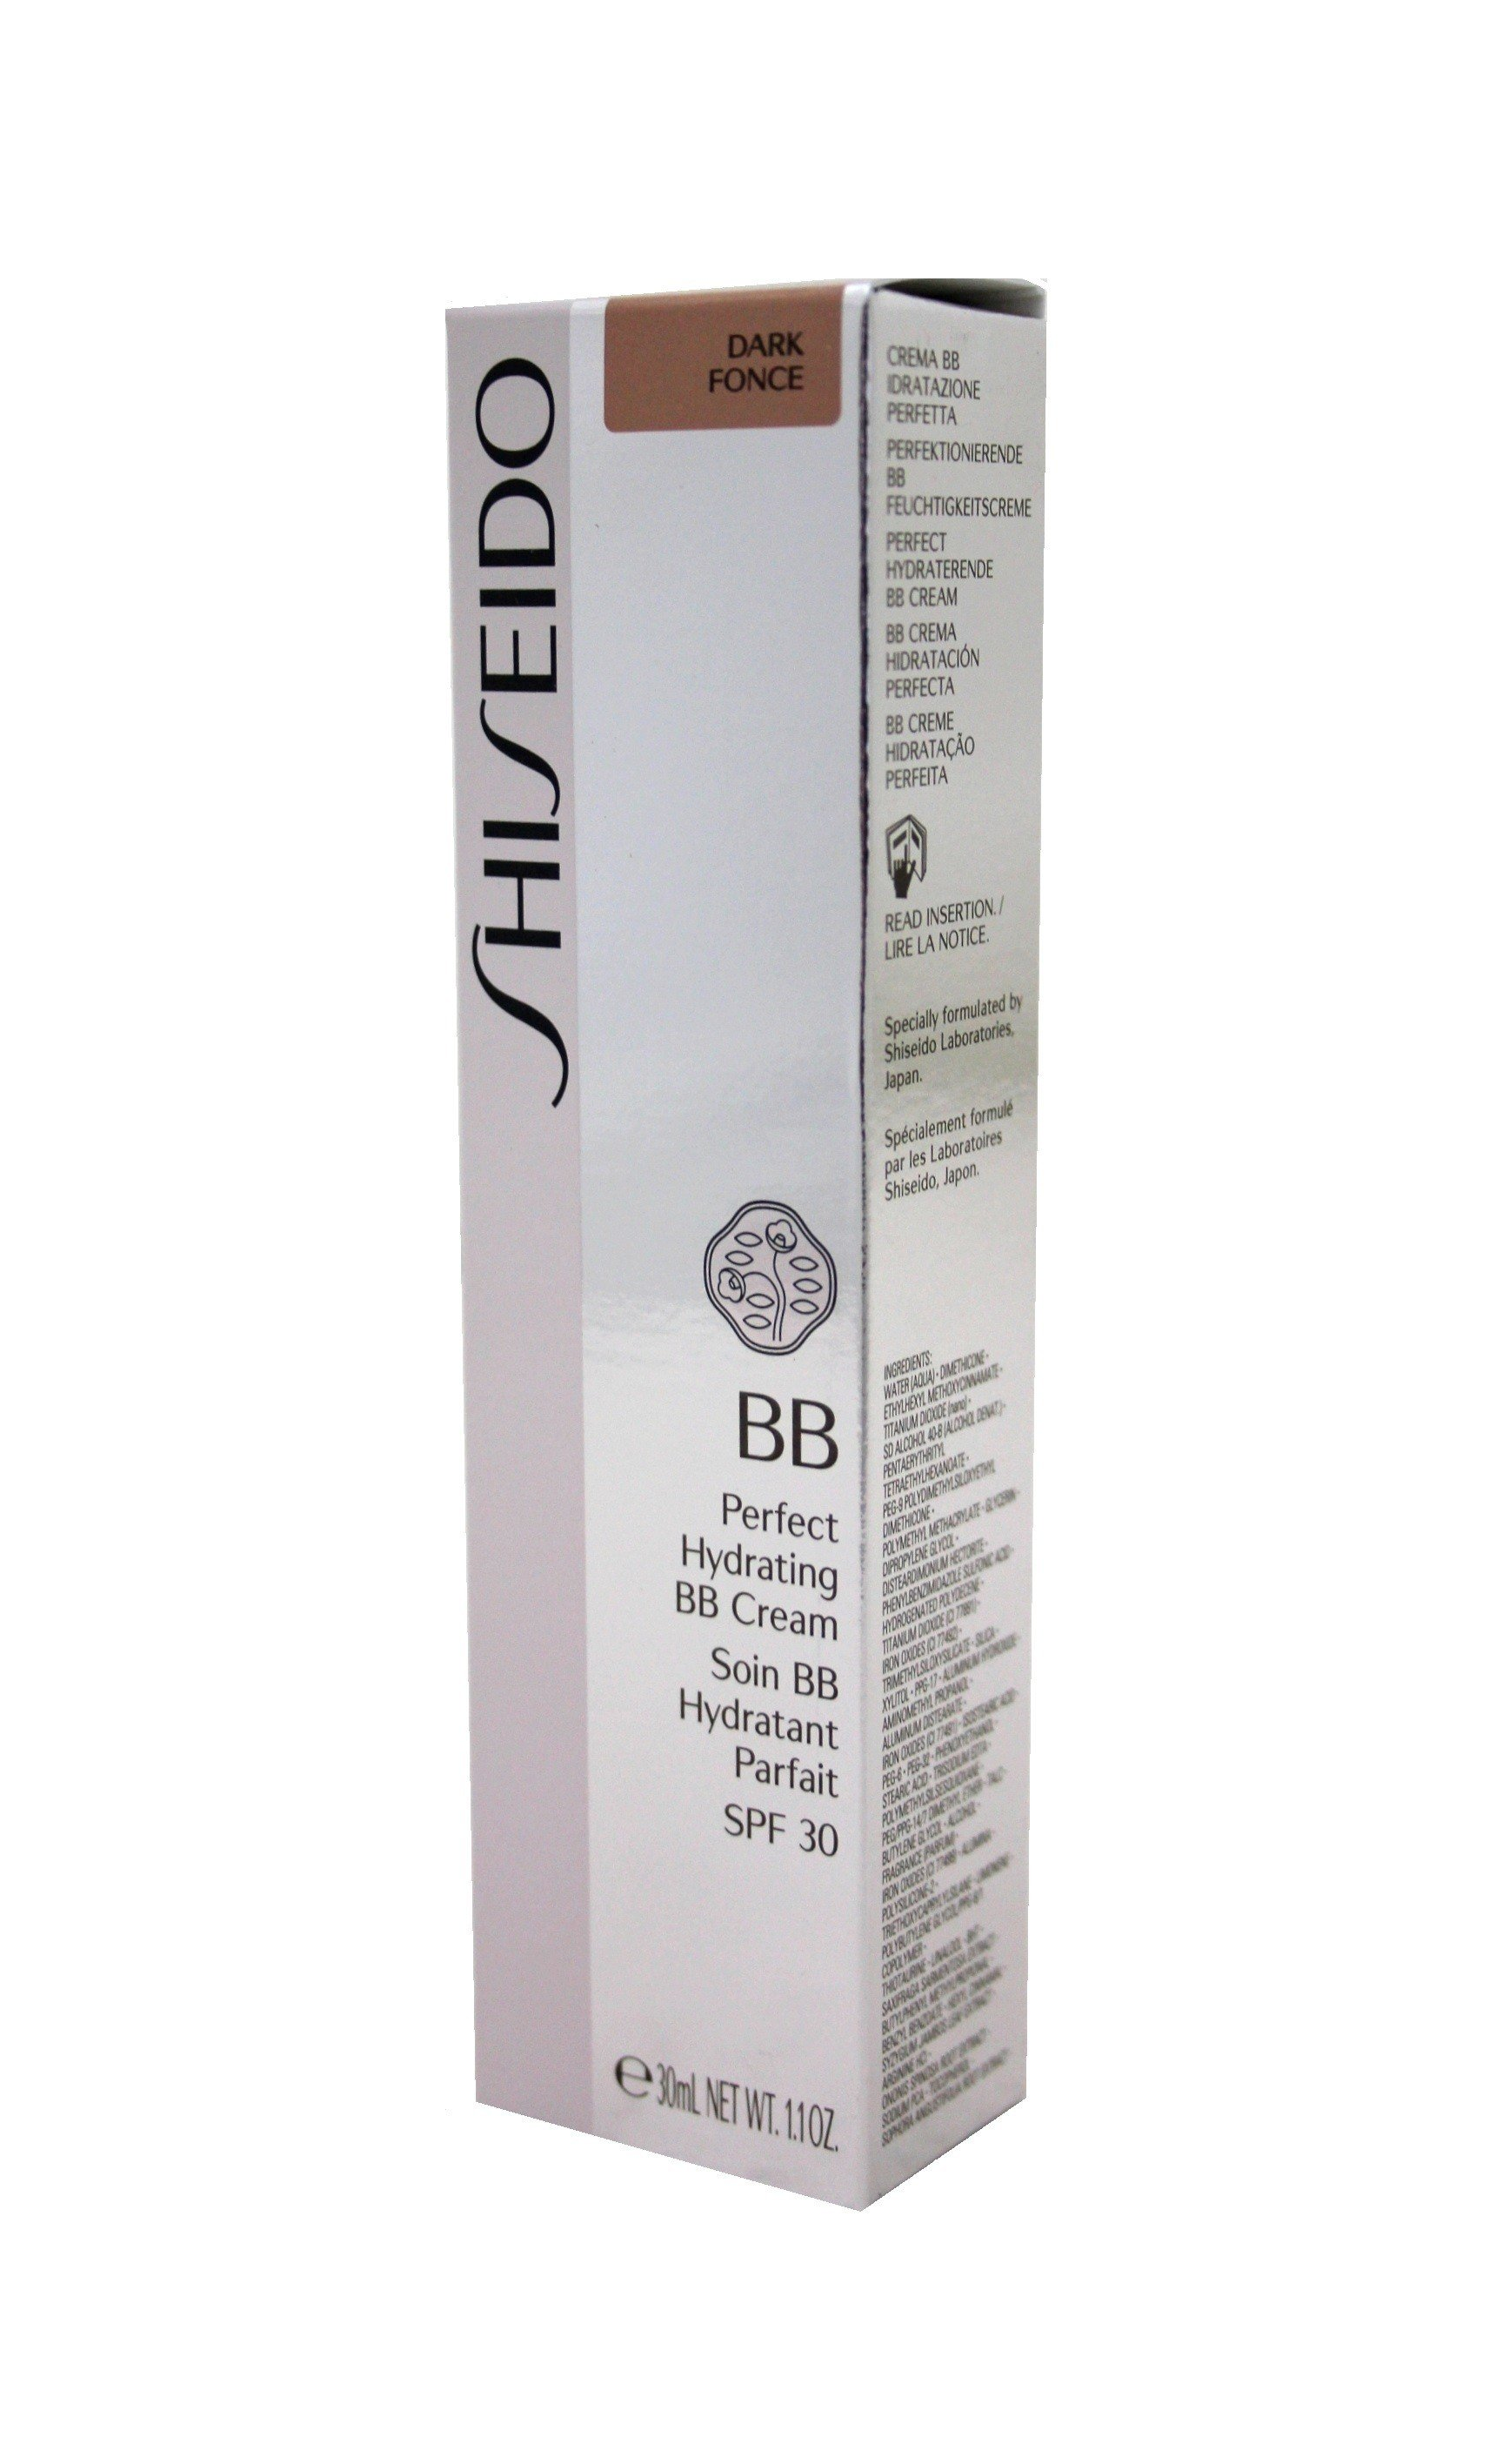 Shiseido Perfect Hydrating BB Cream SPF 30 Dark